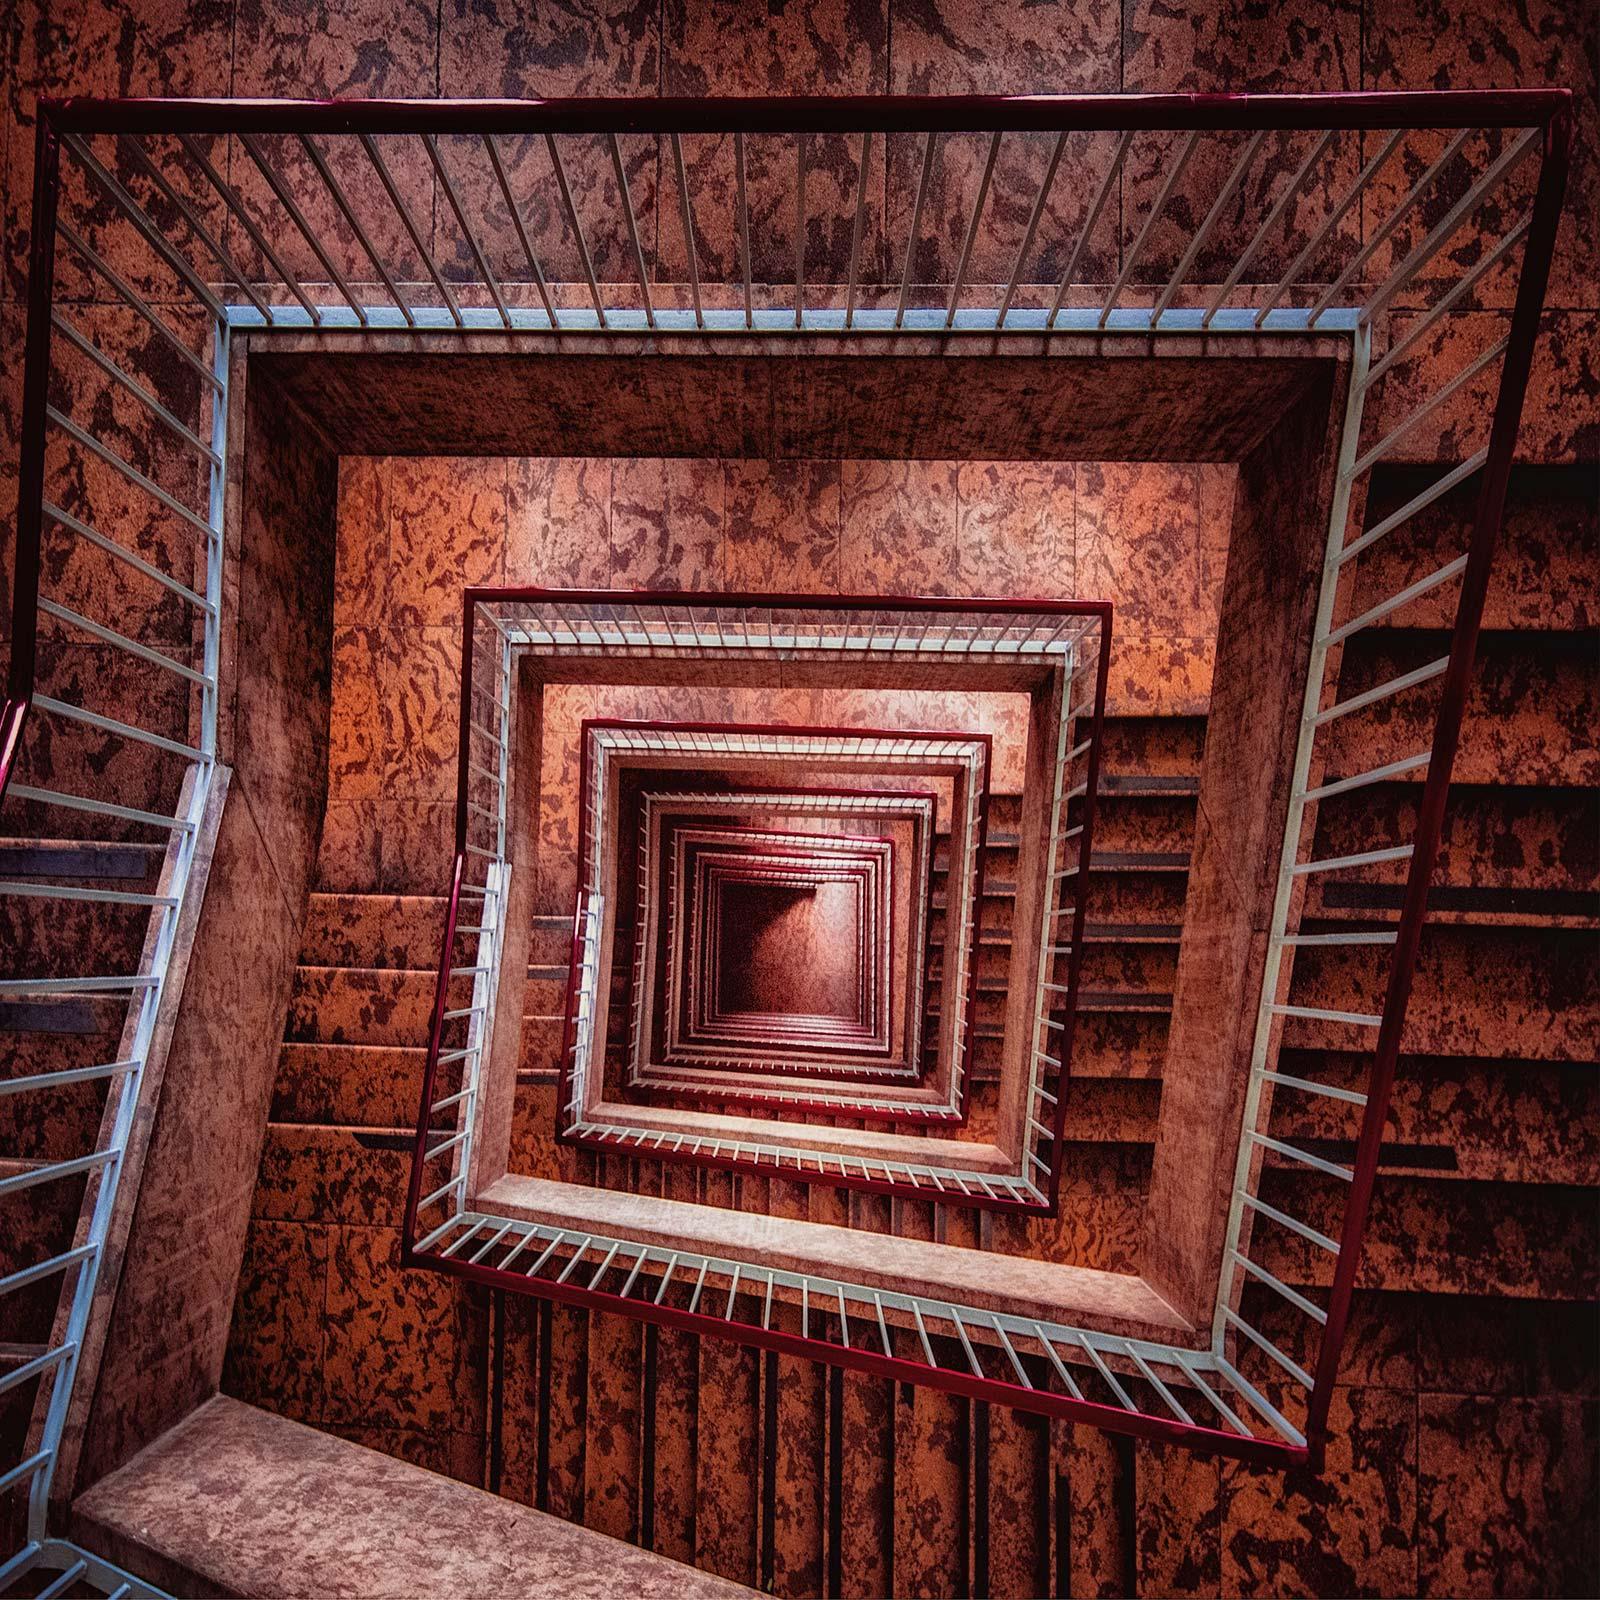 Staircase VI by Markus Studtmann